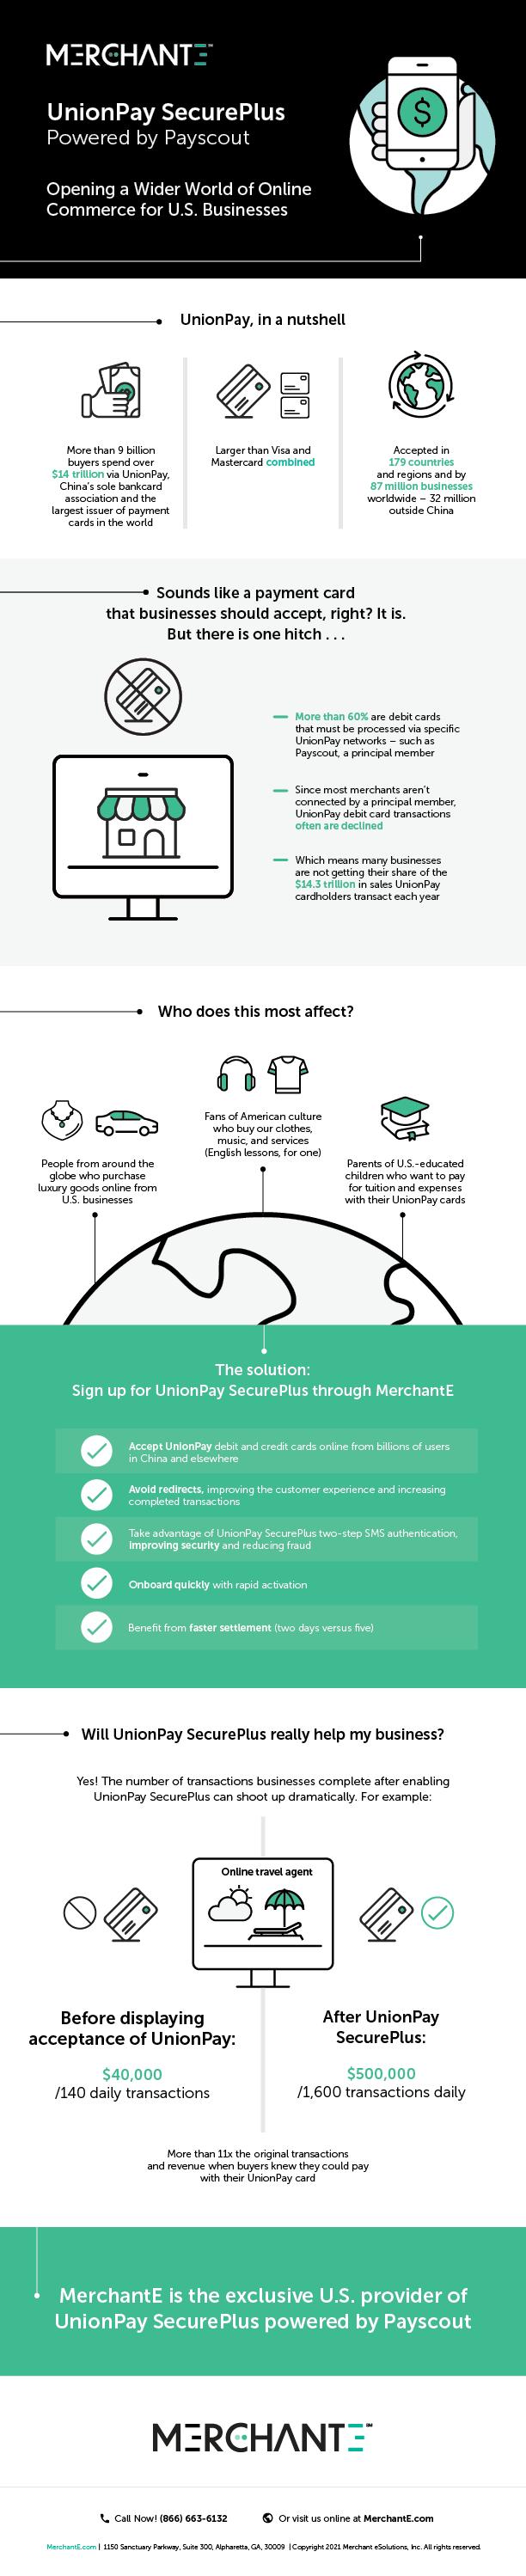 UnionPay SecurePlus Blog Infographic